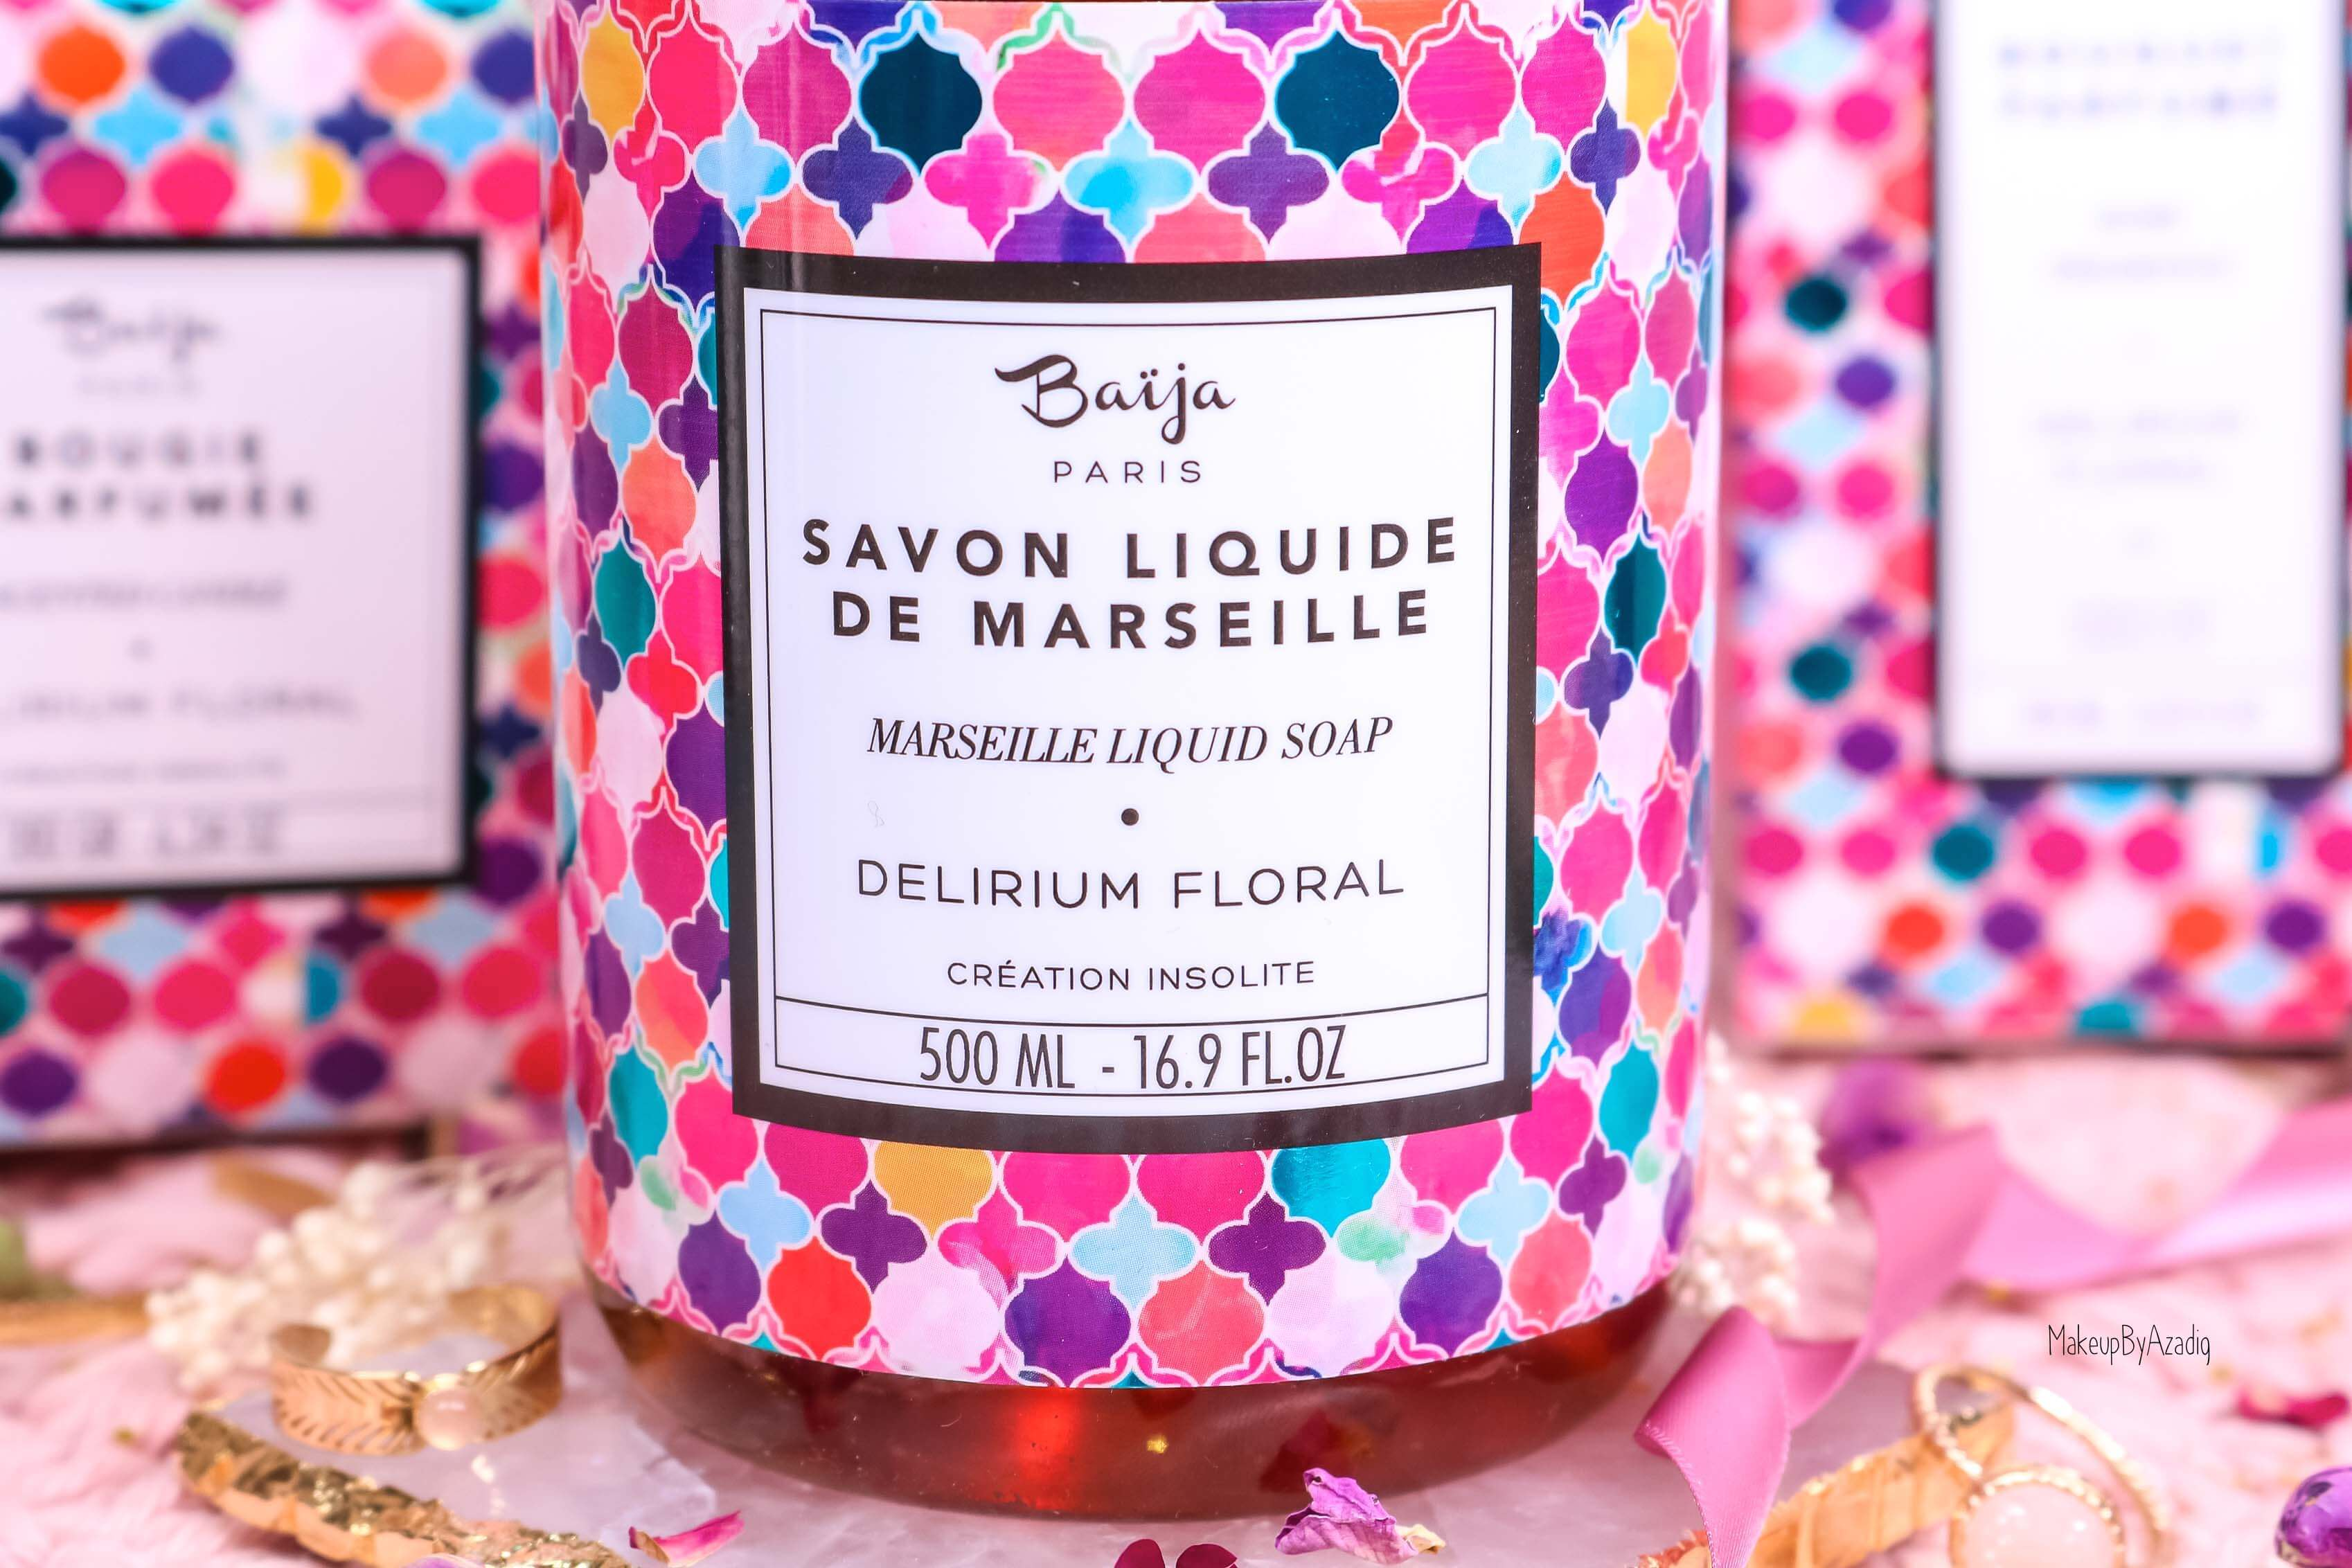 revue-collection-delirium-floral-baija-paris-corps-bougie-gommage-soin-fleurs-makeupbyazadig-avis-prix-sephora-creation